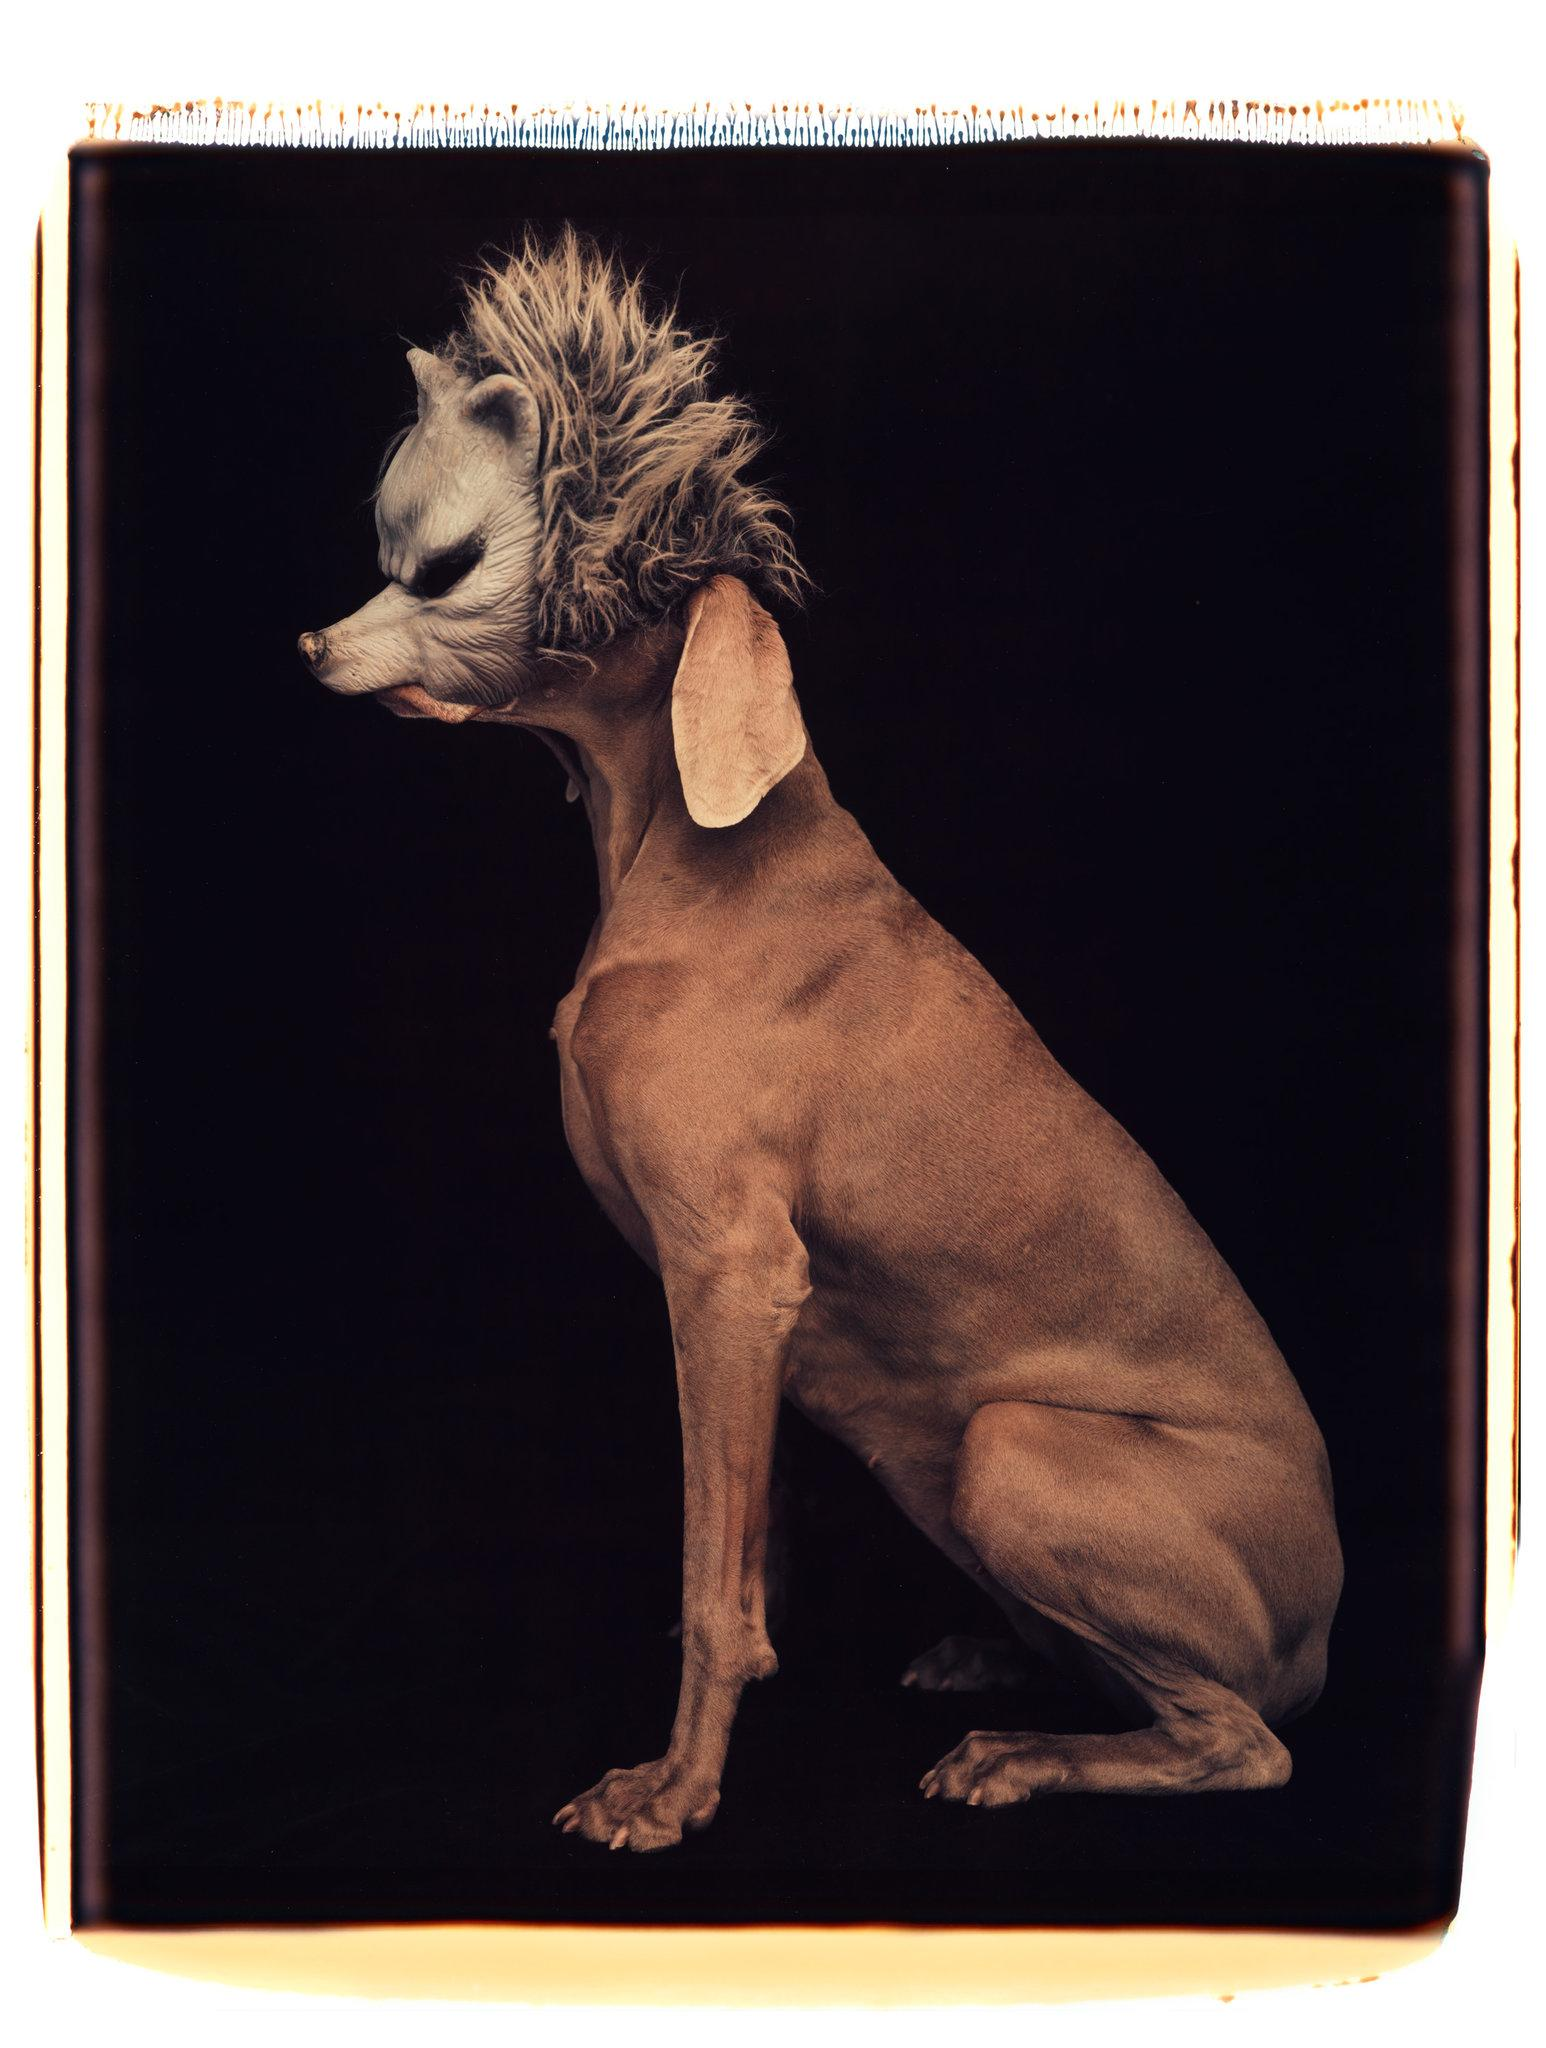 Wolf (Lobo), 1994, William Wegman